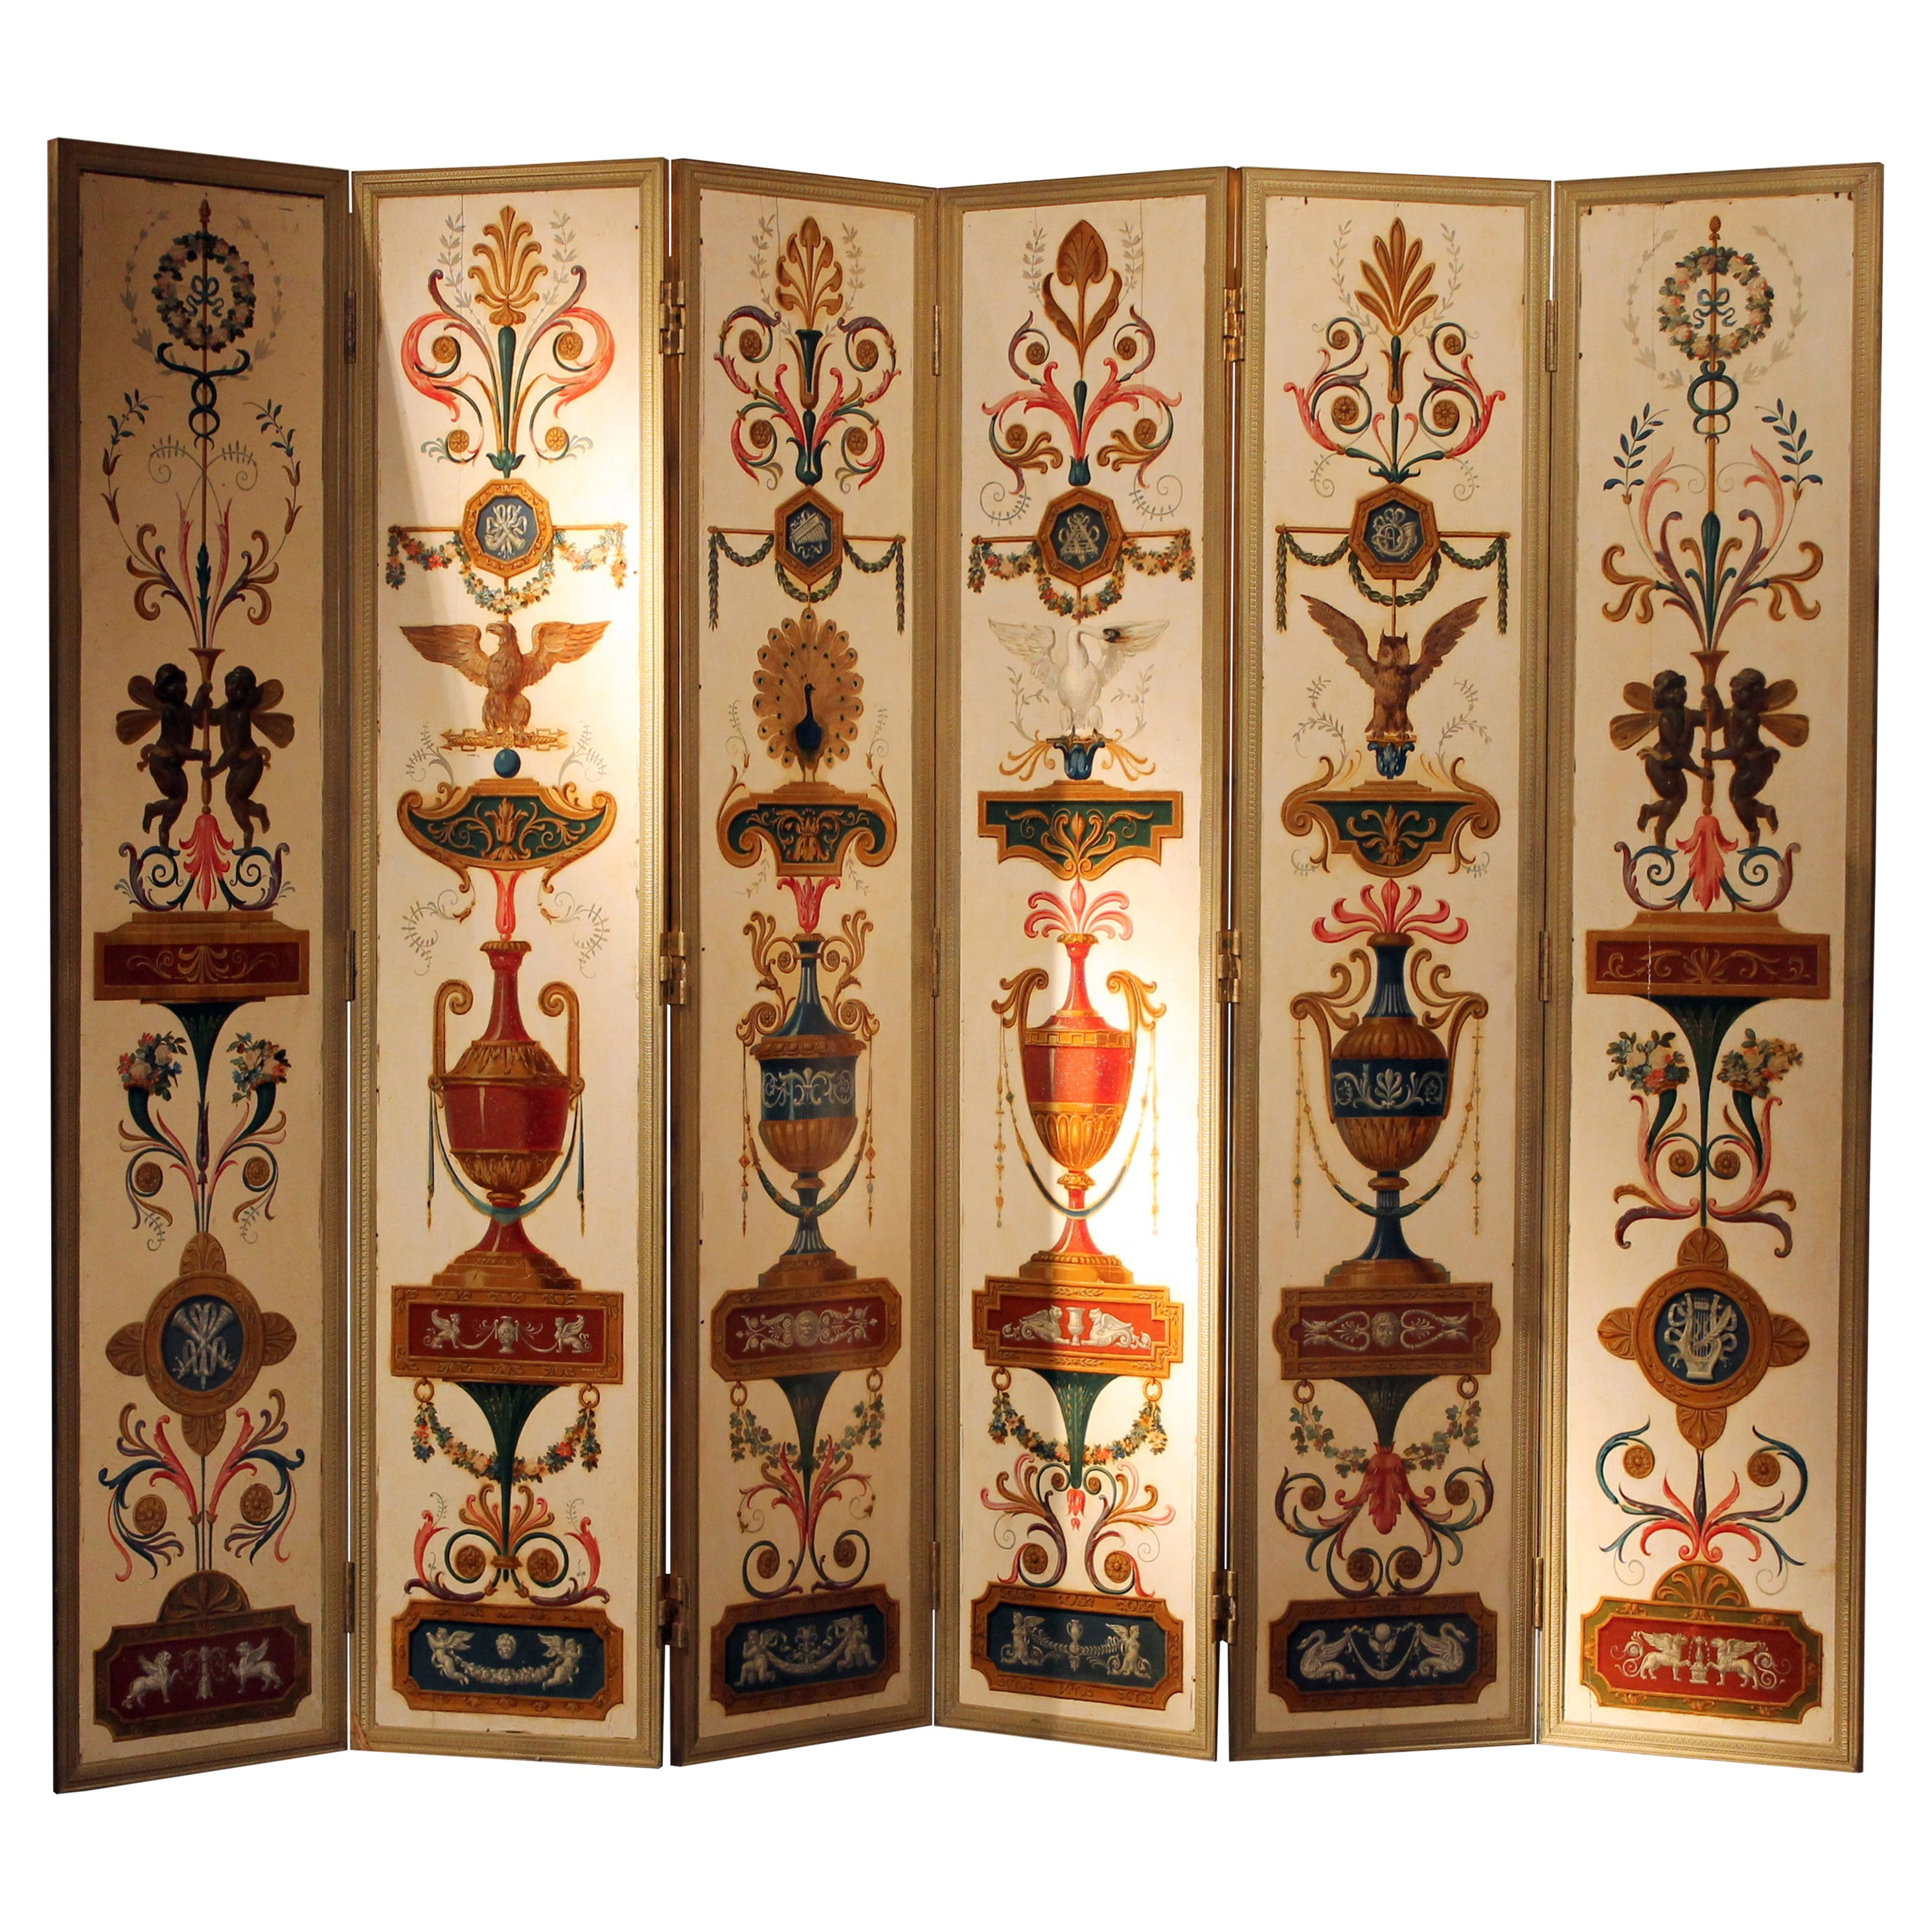 19th Century Italian Six-Panel Painted Wood Folding Screen in Gilt Bronze Frame